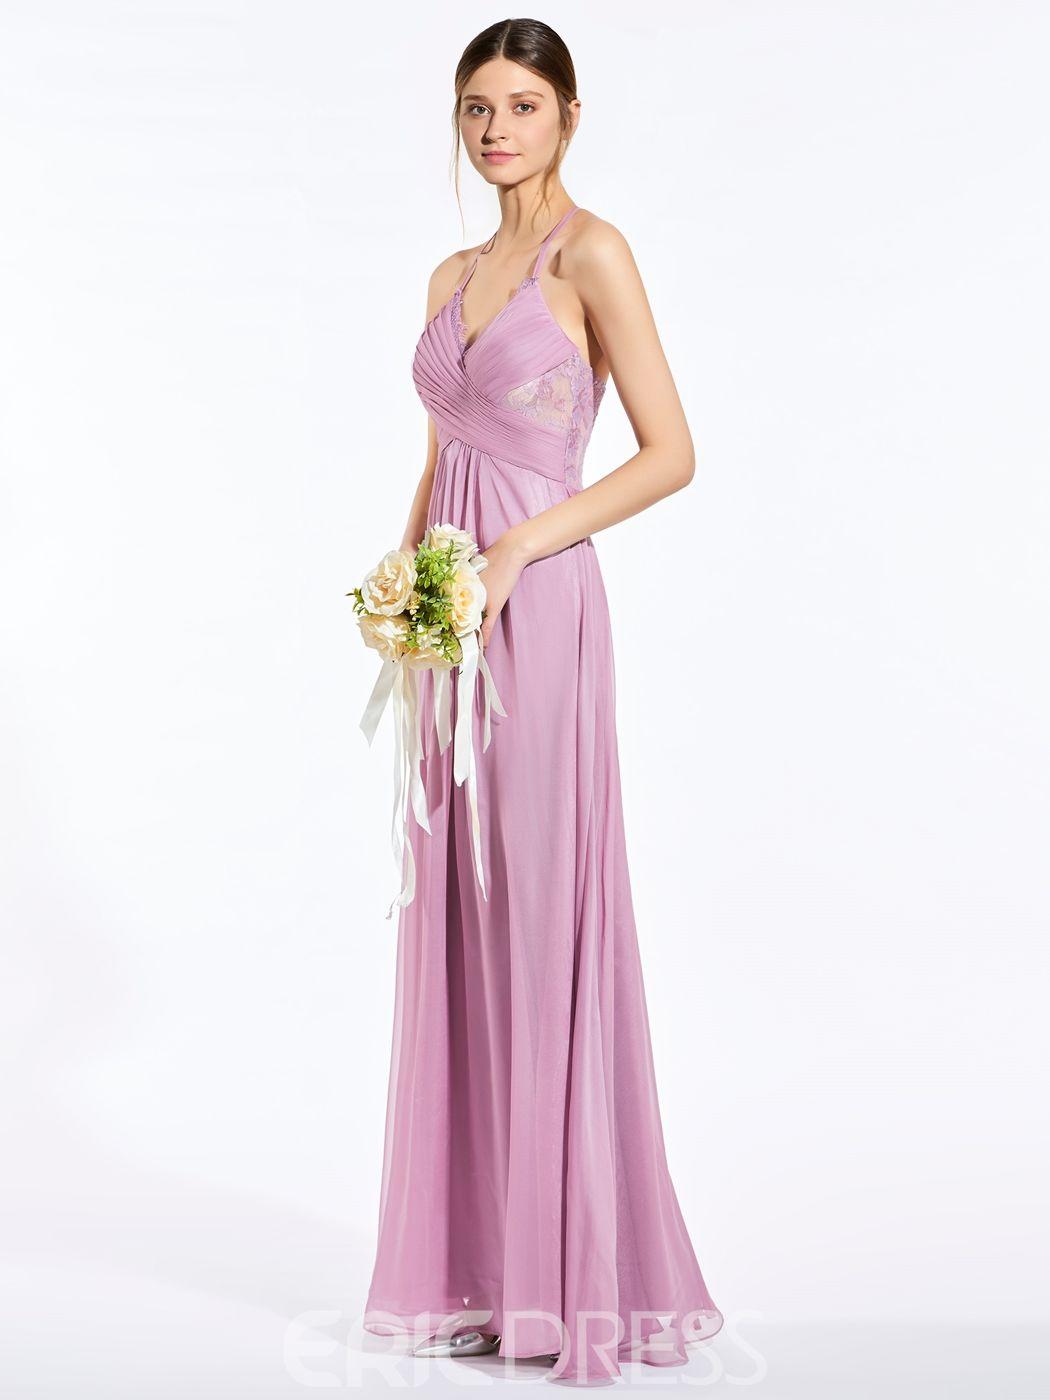 Popular halter a line long bridesmaid dress in bridesmaids